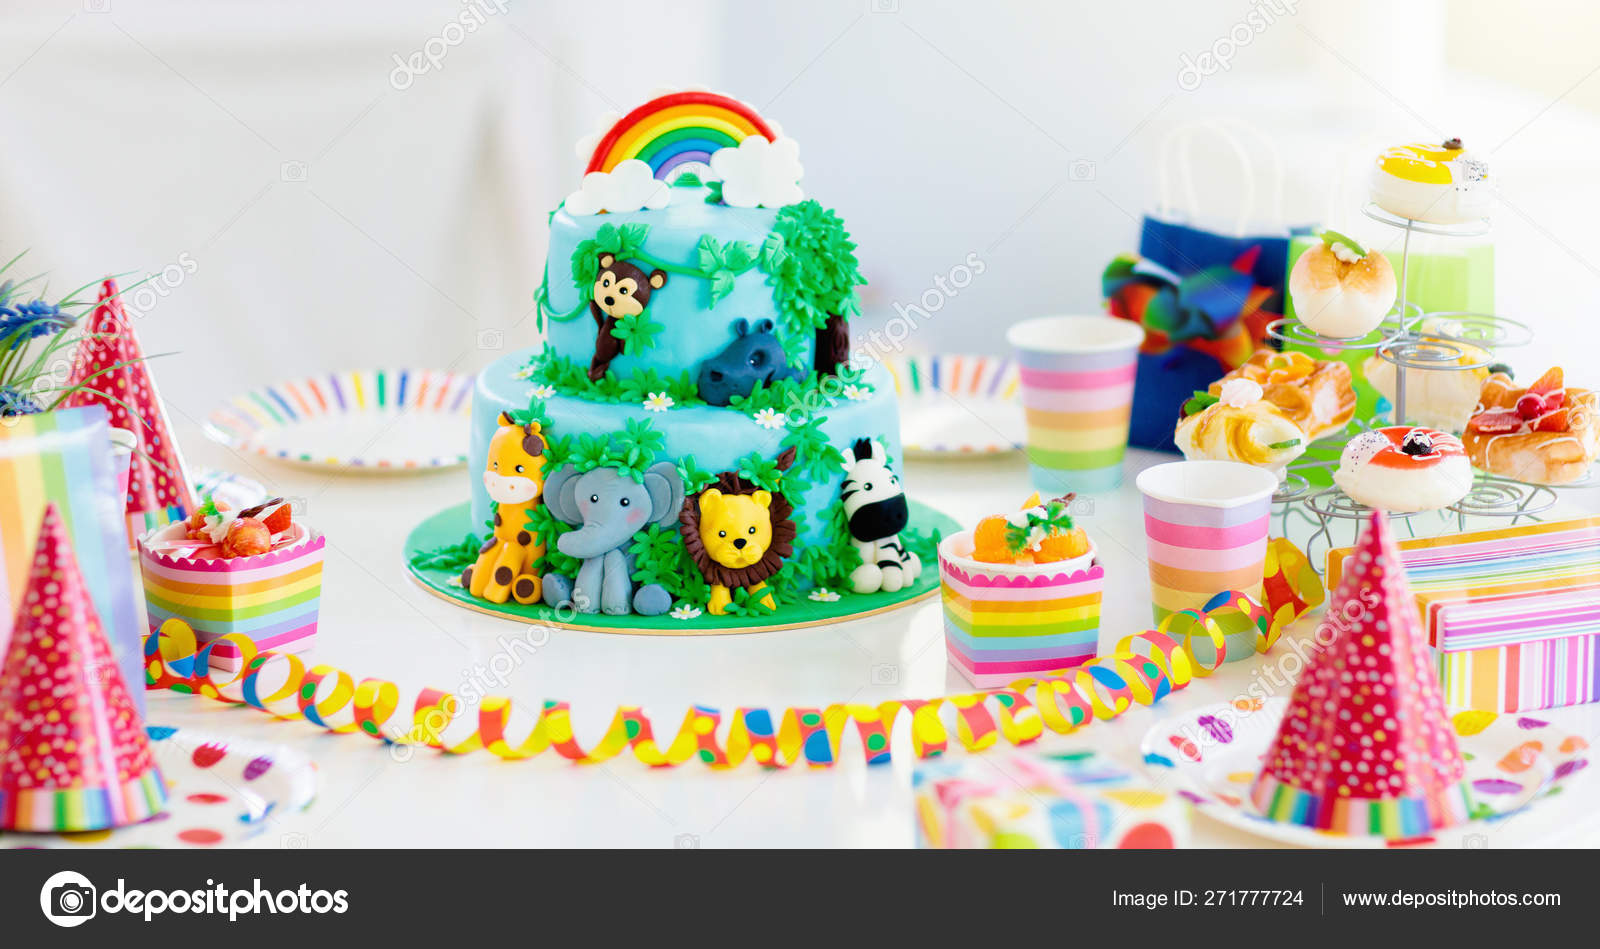 Marvelous Kids Birthday Cake Child Jungle Theme Party Stock Photo Personalised Birthday Cards Sponlily Jamesorg